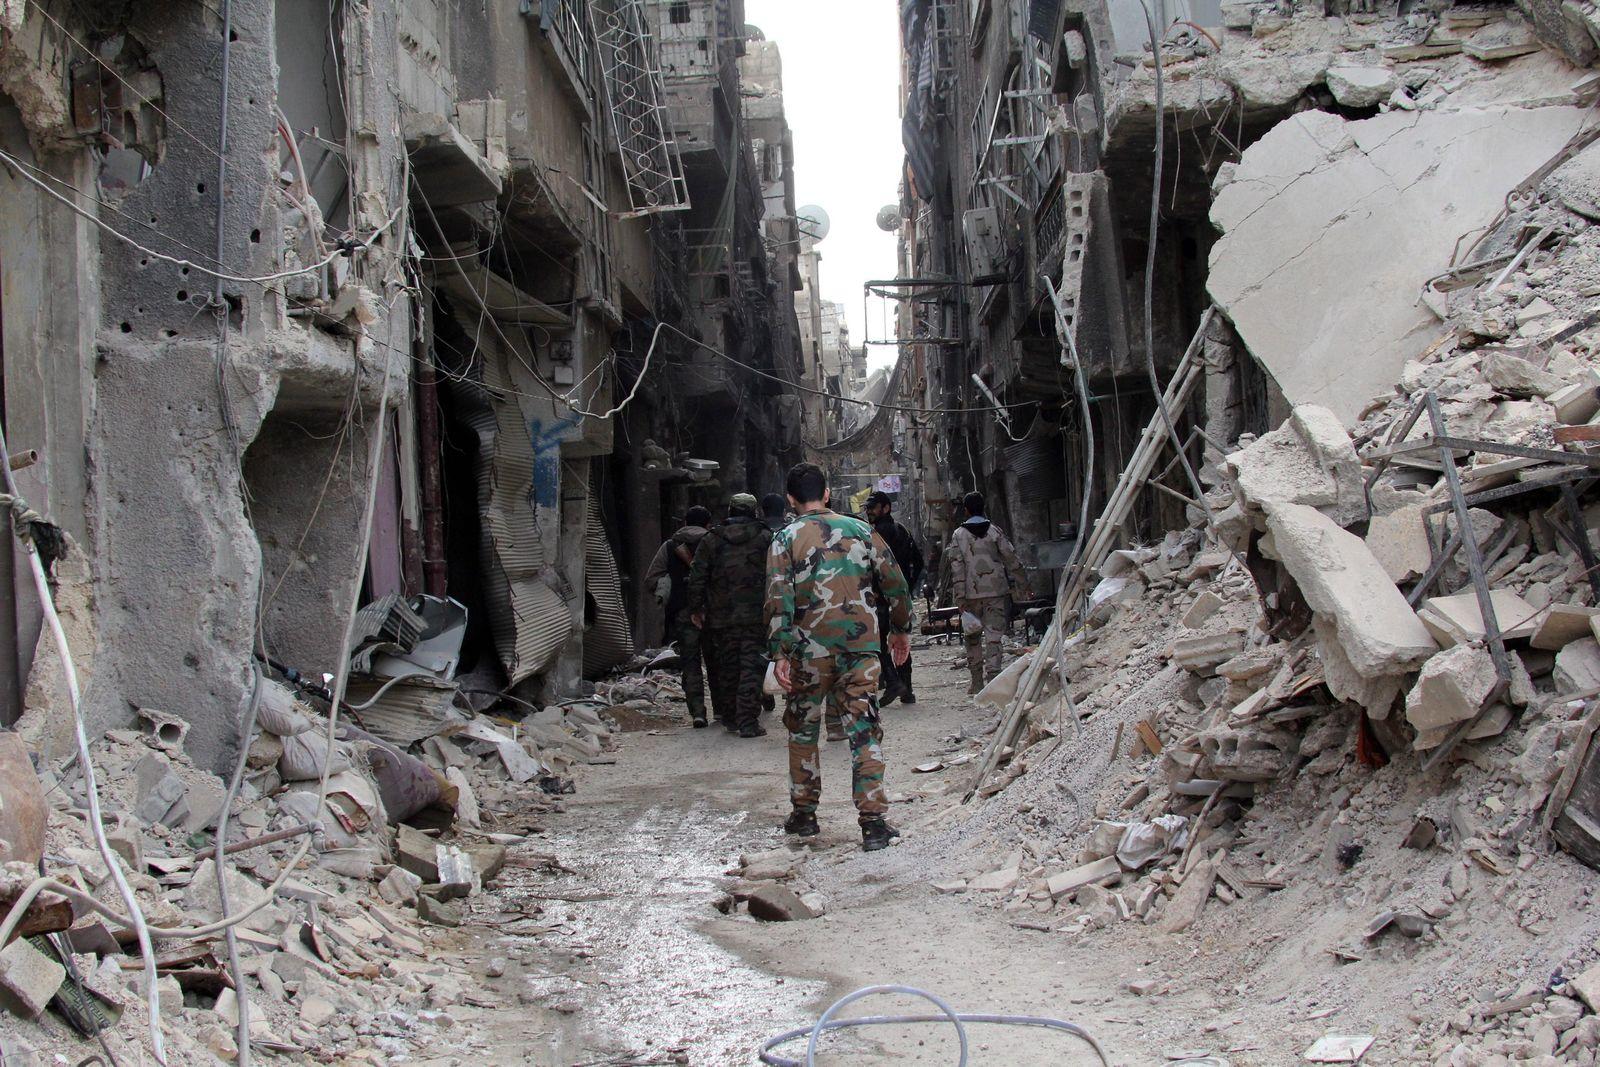 Yarmouk / Jarmuk